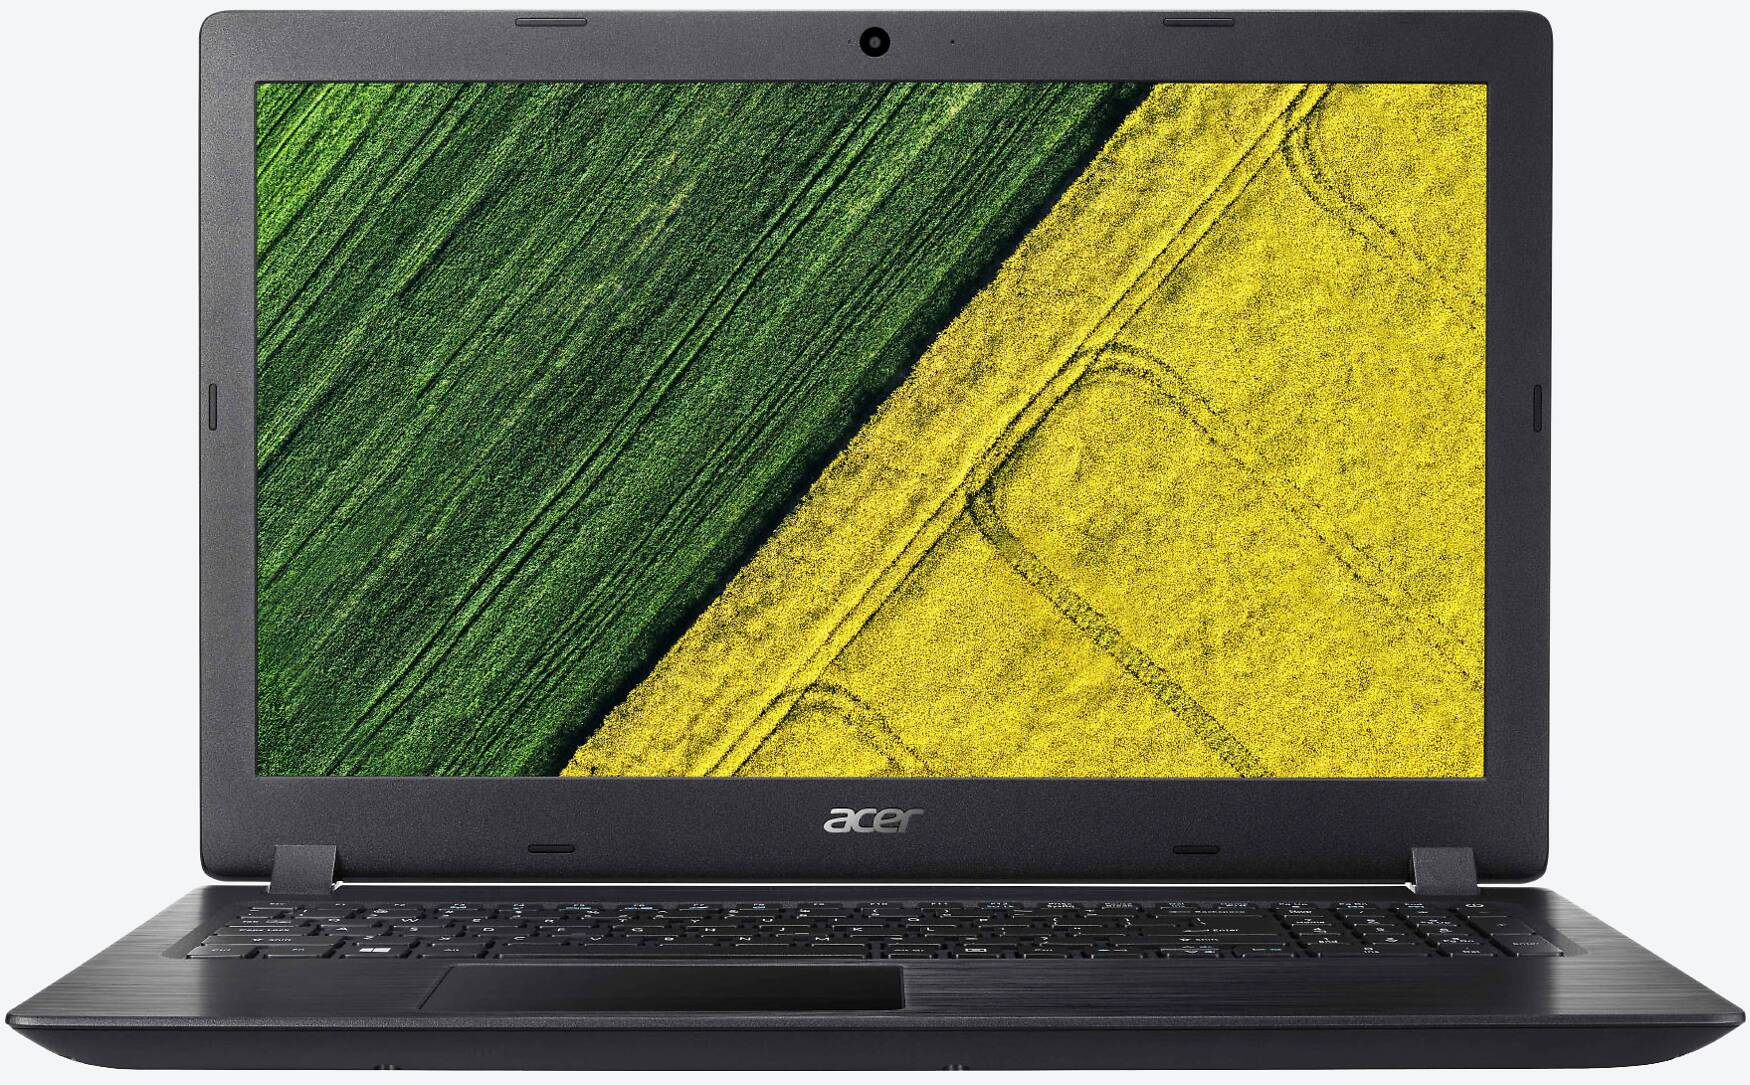 Acer Aspire 3 A315-53-583N